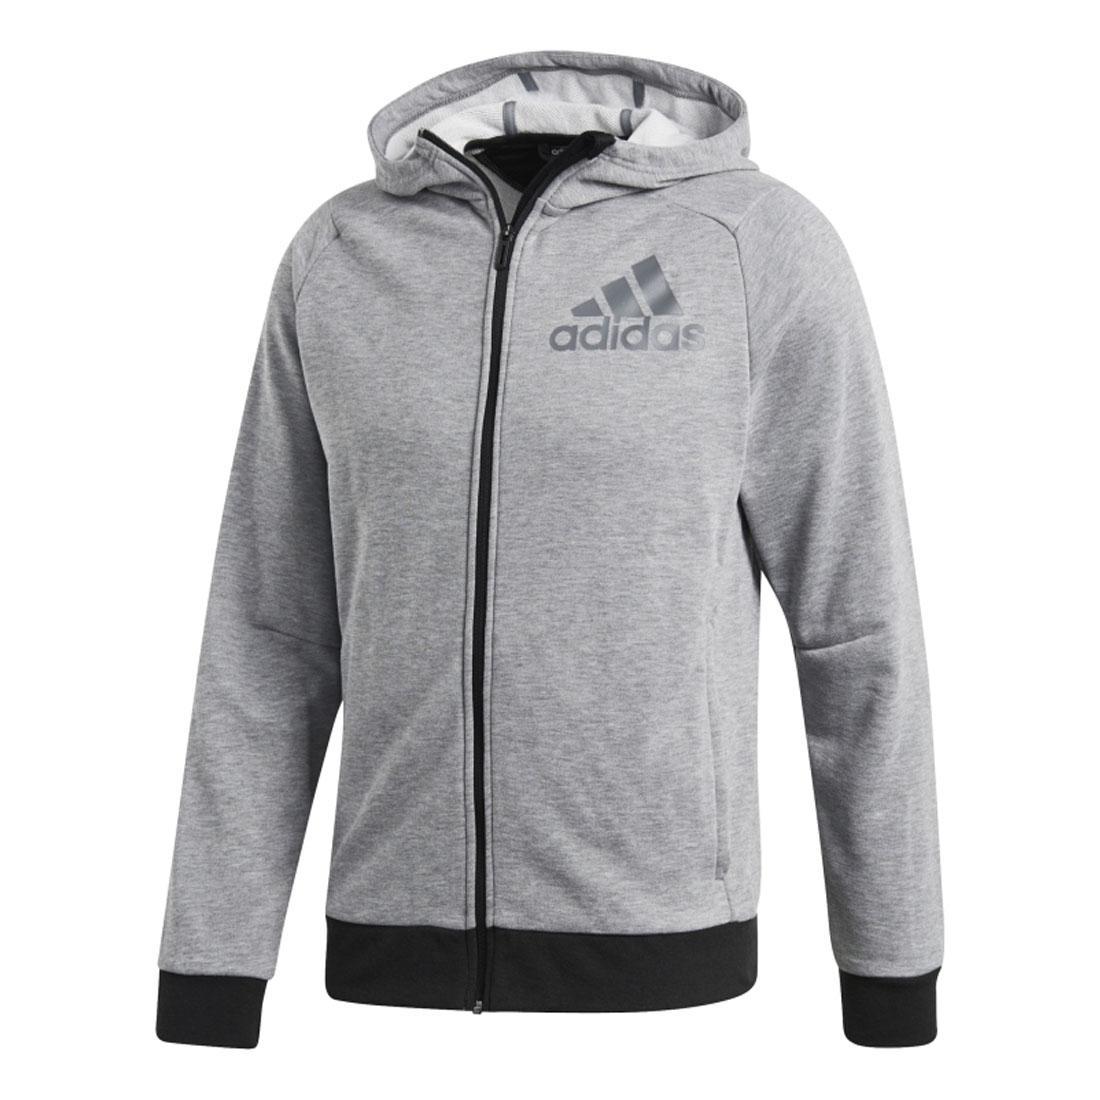 e158b7dea35df Adidas Mens gris negro con capucha gimnasio primer completo Zip deportes  Fitness sudadera S-XL